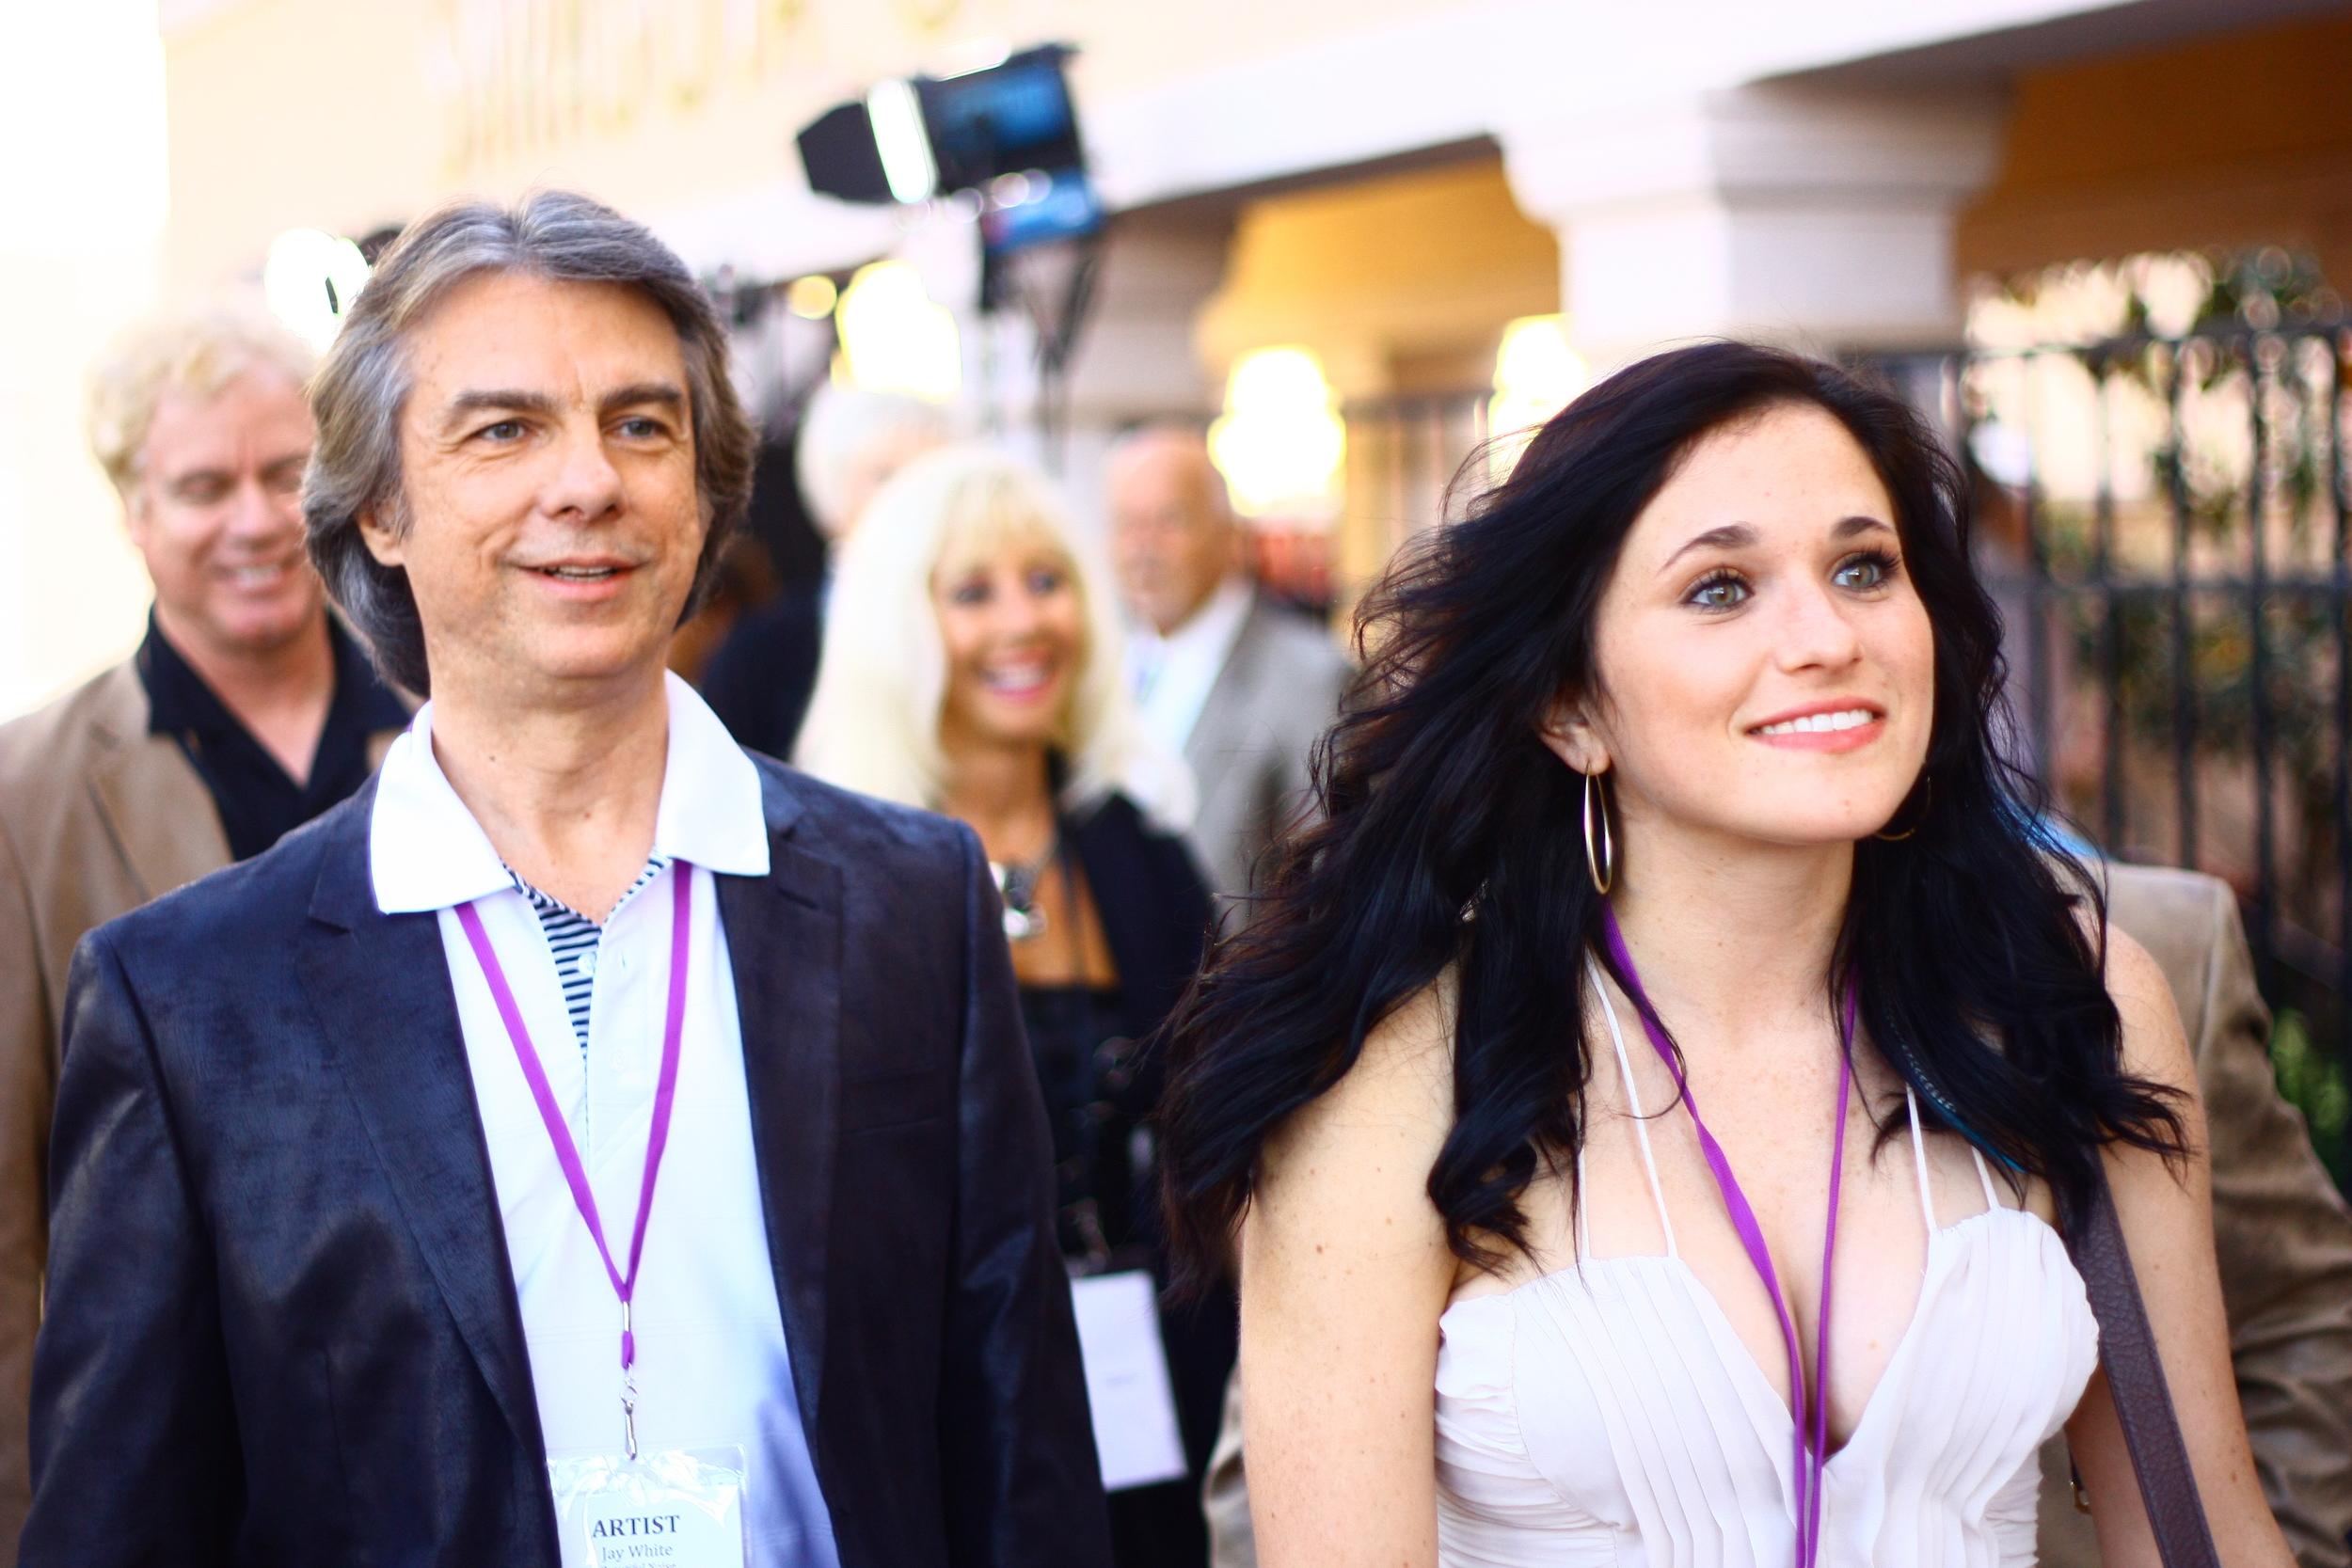 5 things at the Sarasota Film Festival